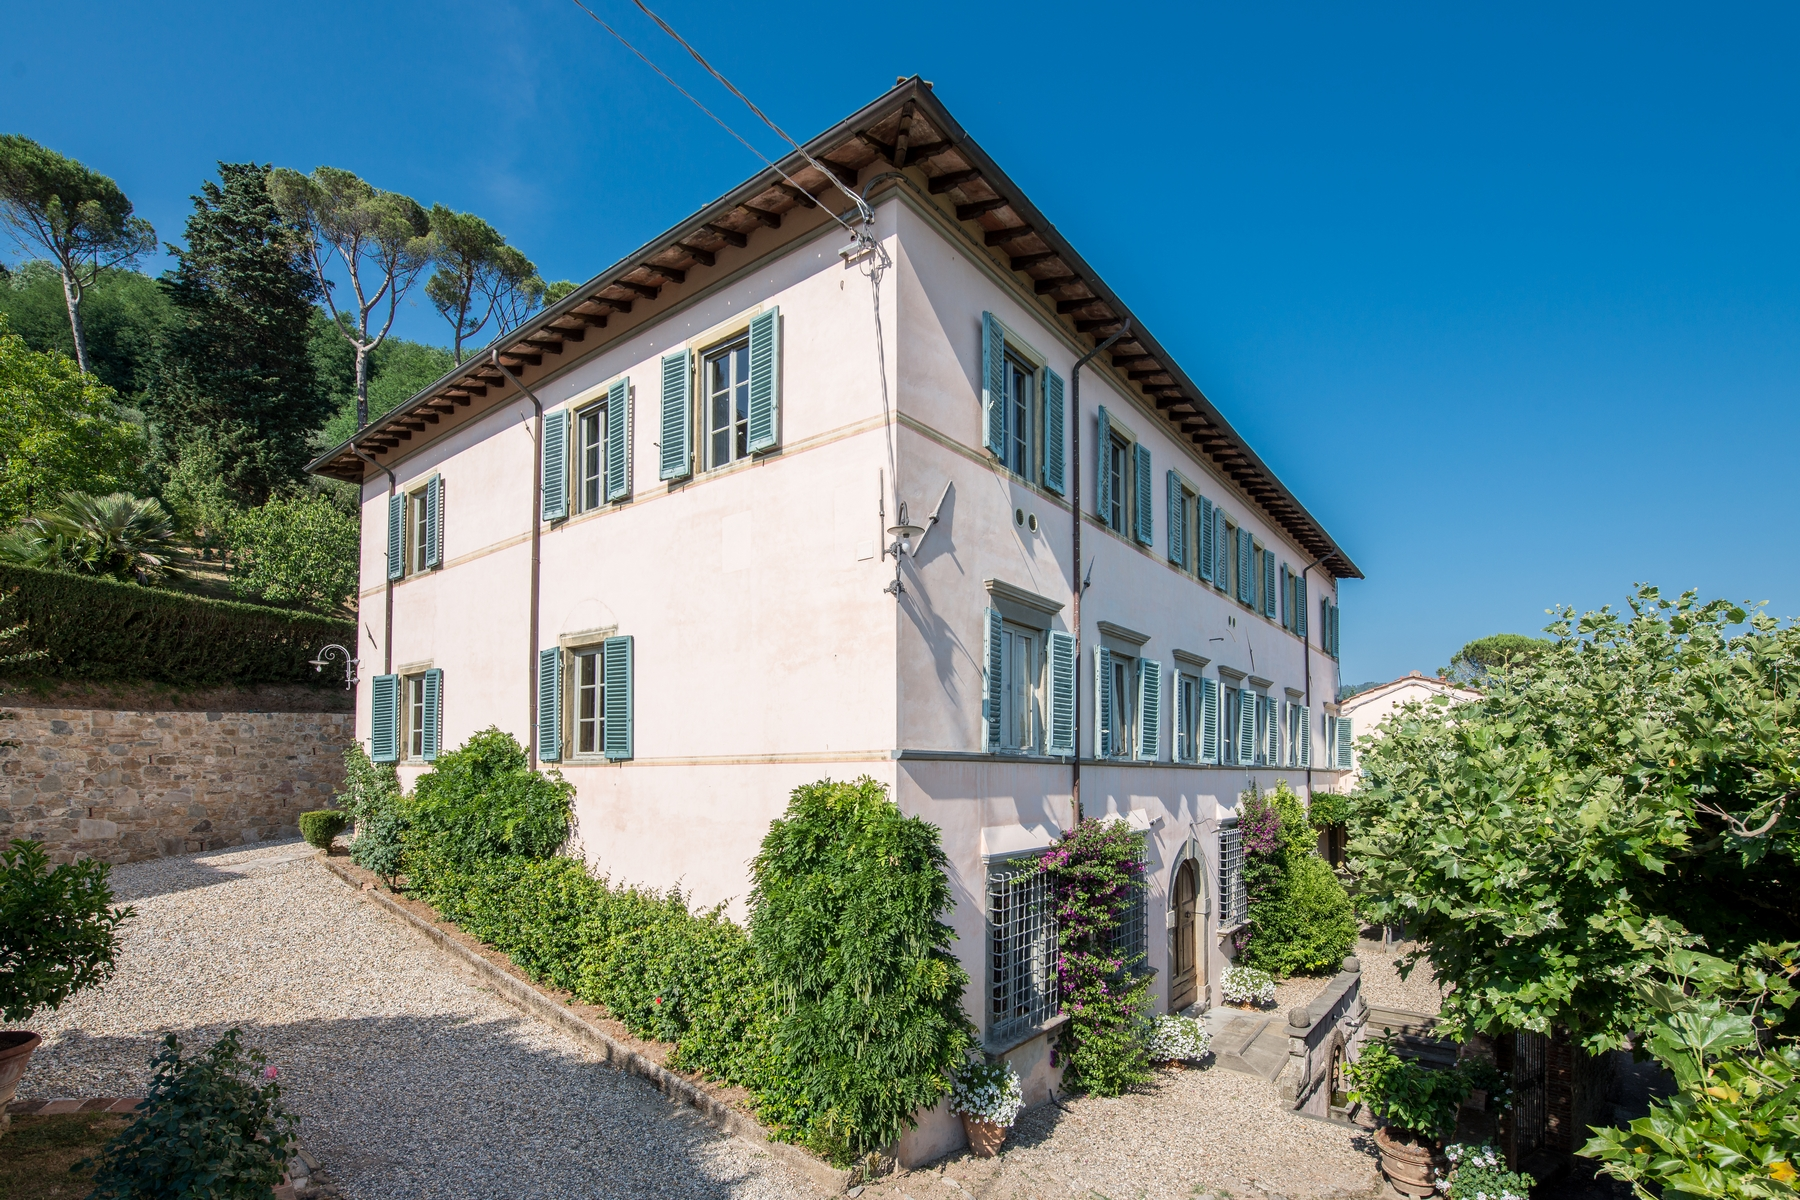 Villa in Vendita a Lucca: 5 locali, 2500 mq - Foto 1